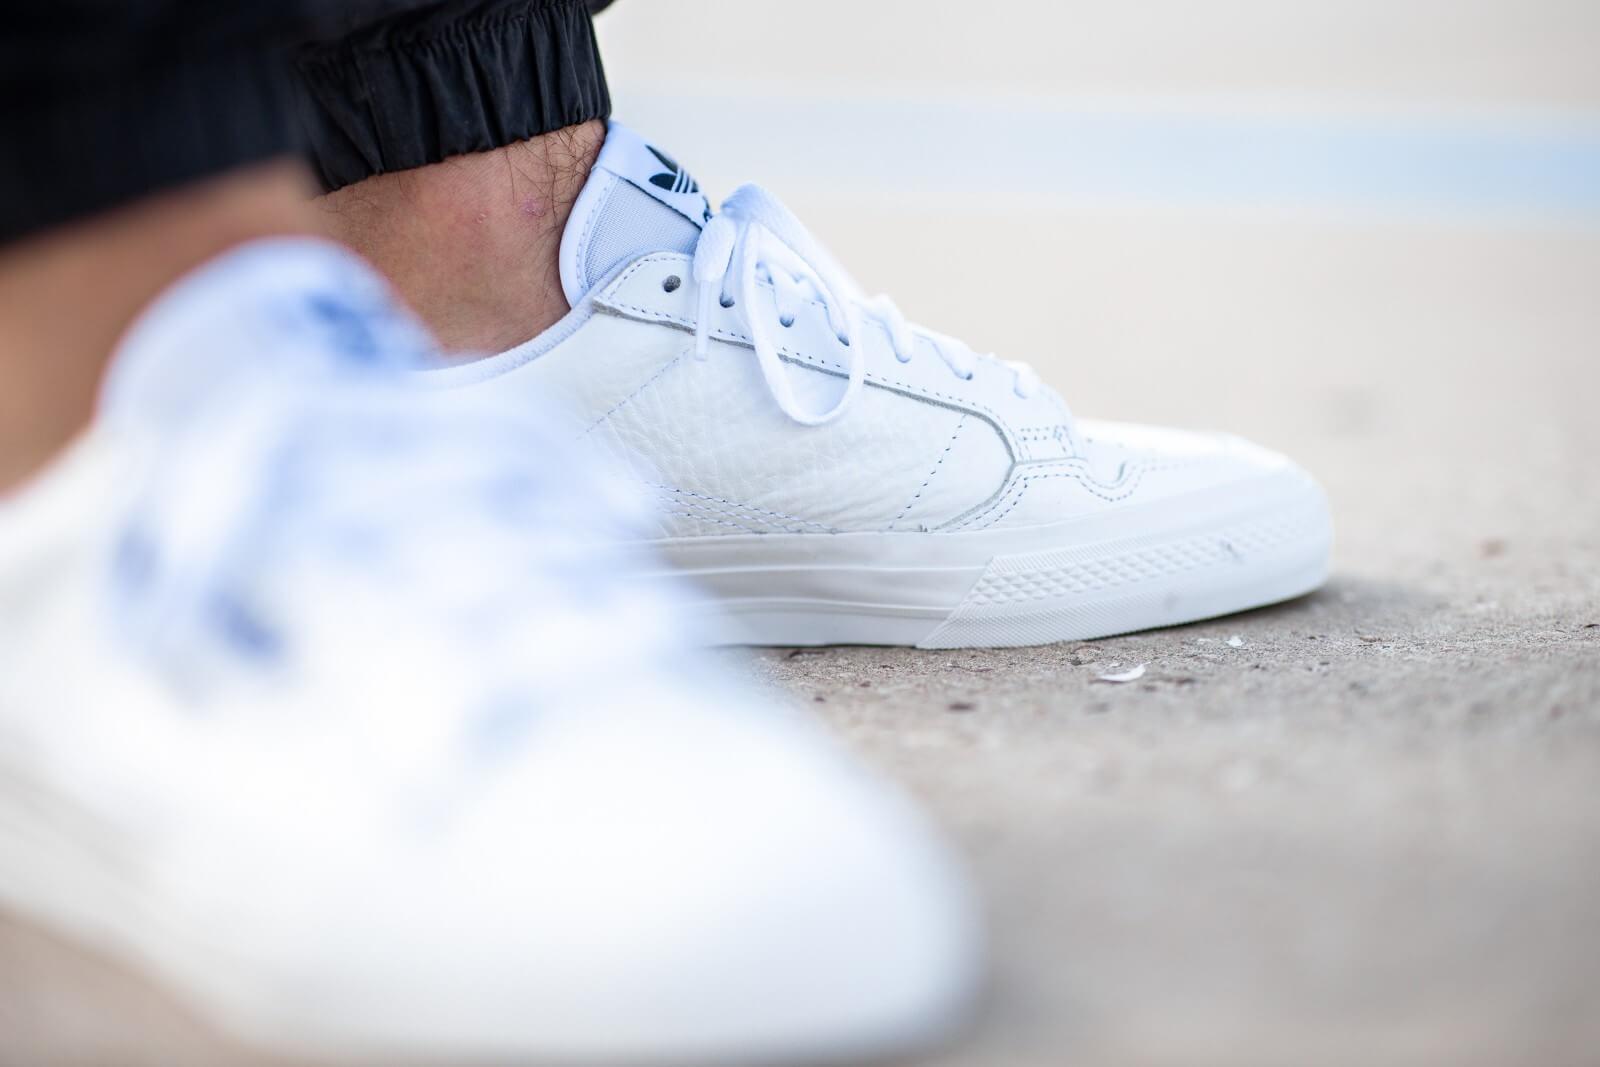 Adidas Continental Vulc Footwear White/Collegiate Navy - EG4588